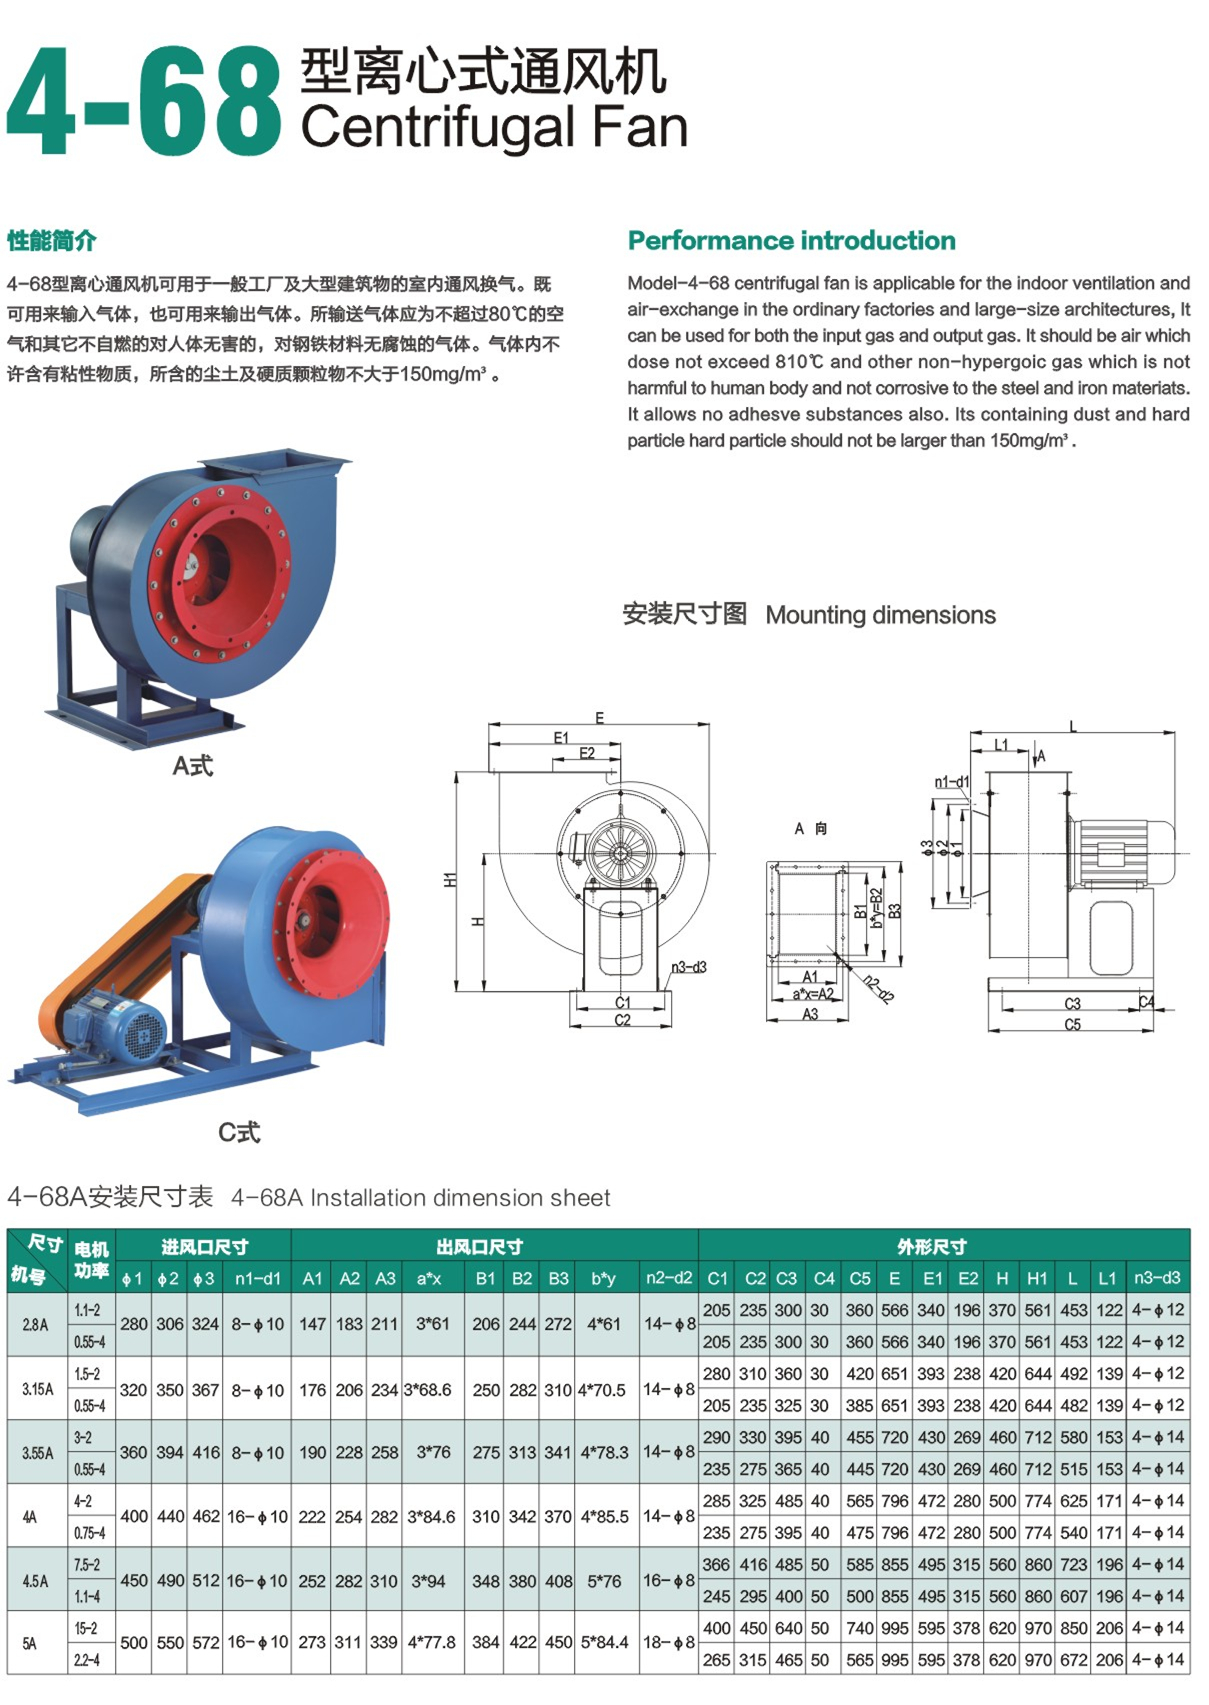 High Pressure Centrifugal Fan 4-68 Large Restaurant Ventilation Blower